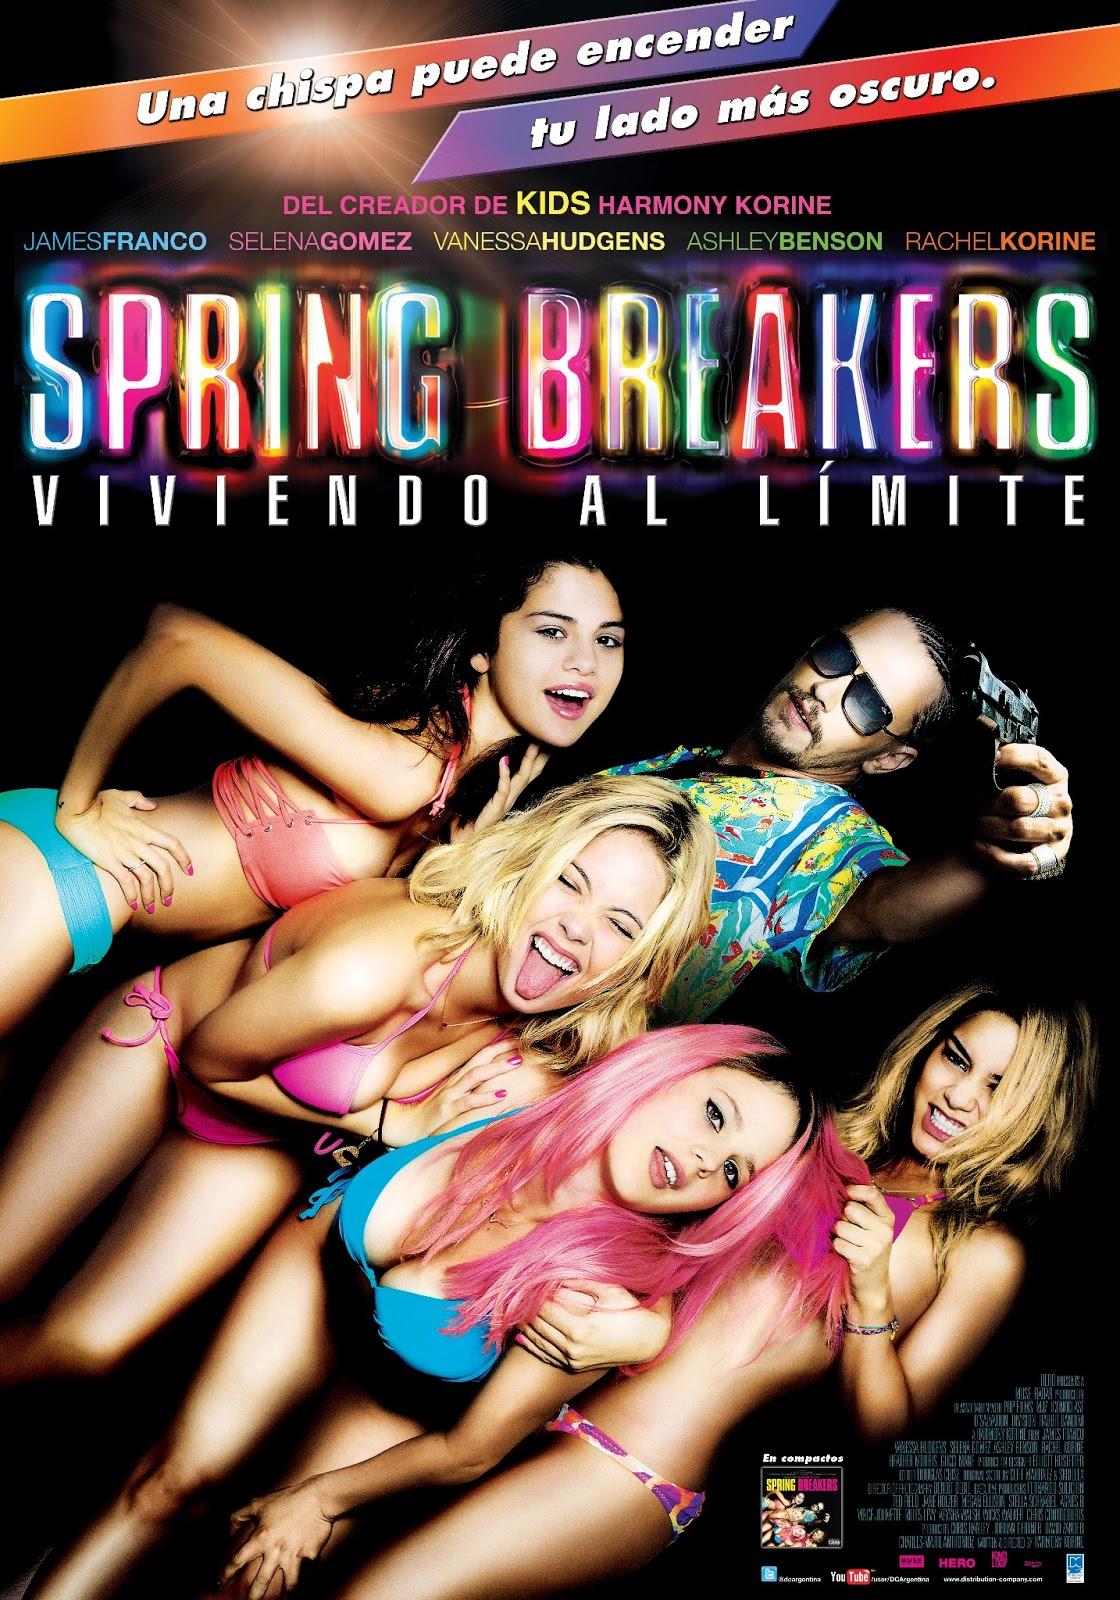 http://2.bp.blogspot.com/-BtU4-npKl8o/UXxTiRim4RI/AAAAAAAAJwE/F62qkTBSvZU/s1600/Spring+Breakers+Poster+Oficial.jpg